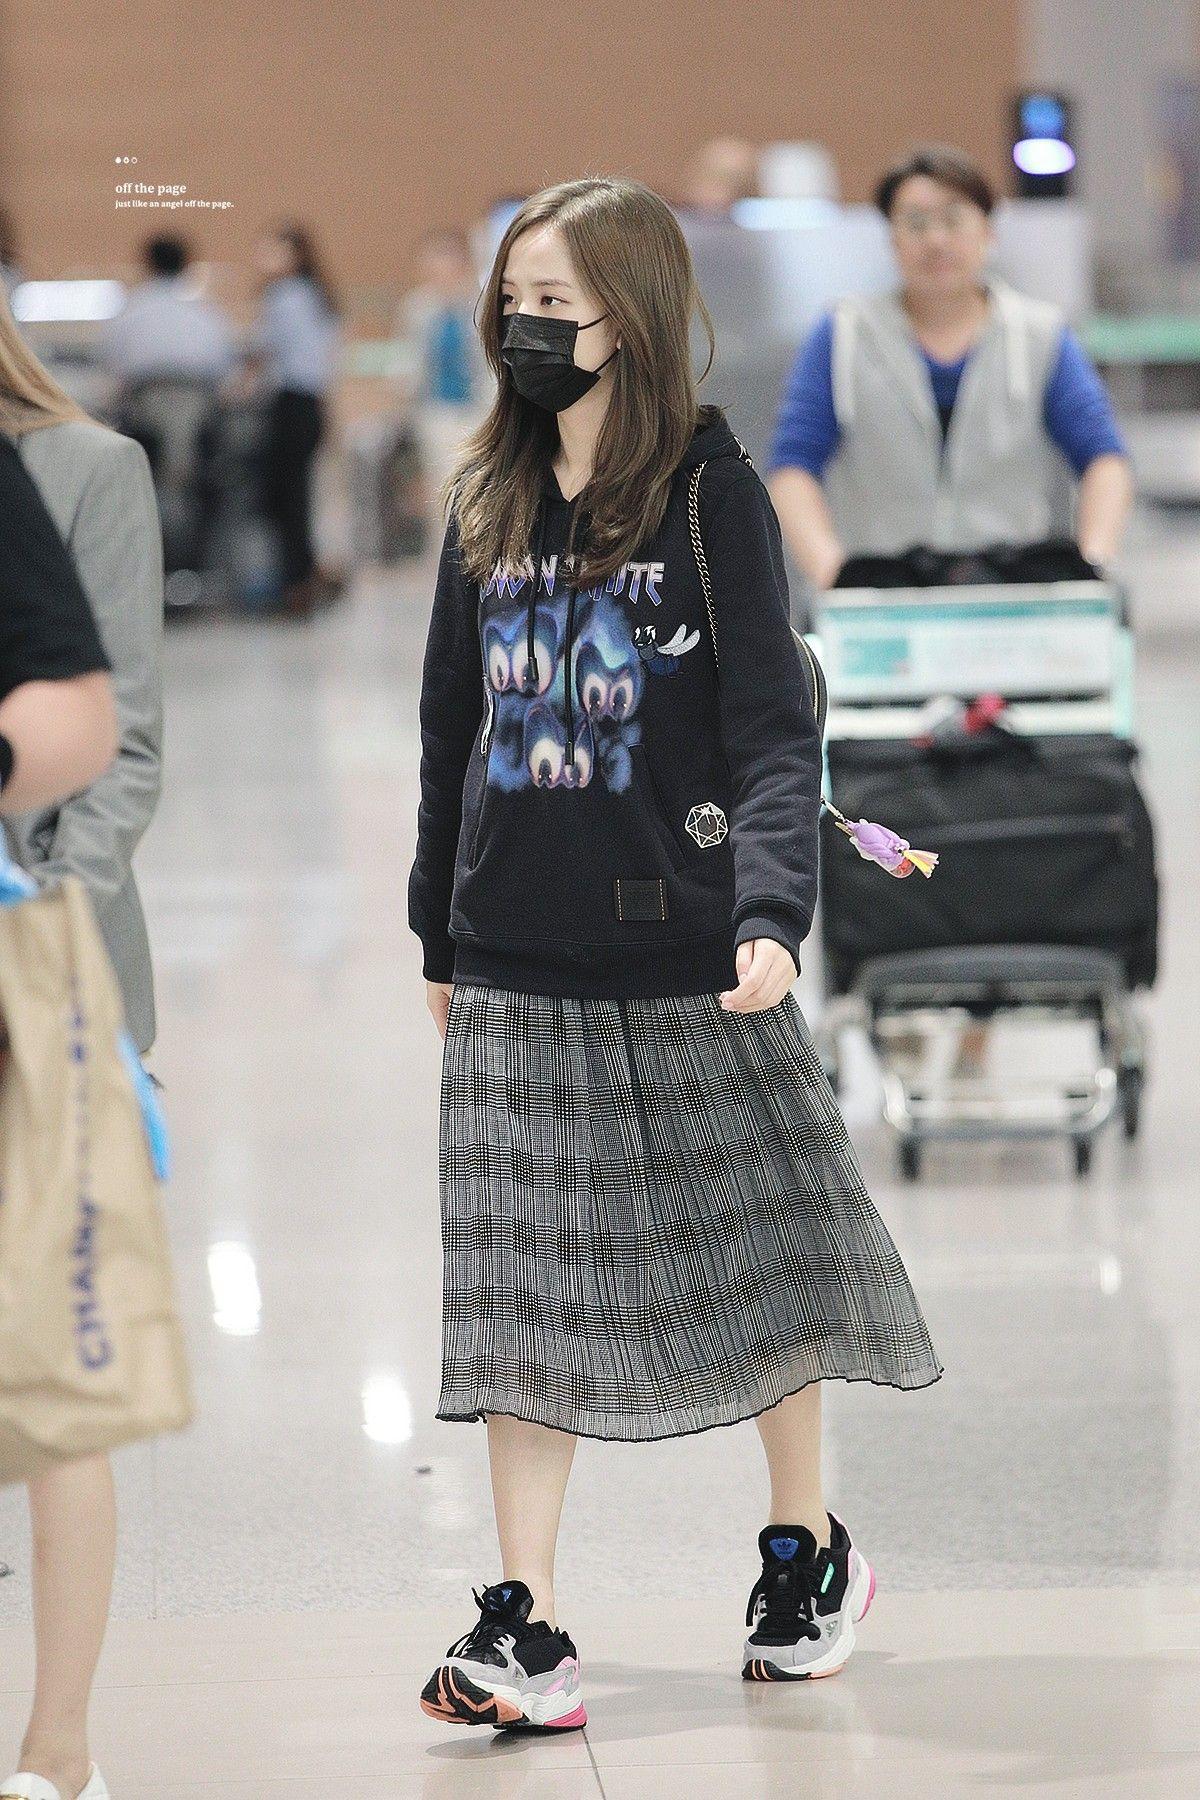 180913 Blackpink At Icn Airport Gaya Model Pakaian Korea Gaya Model Pakaian Gaya Ulzzang